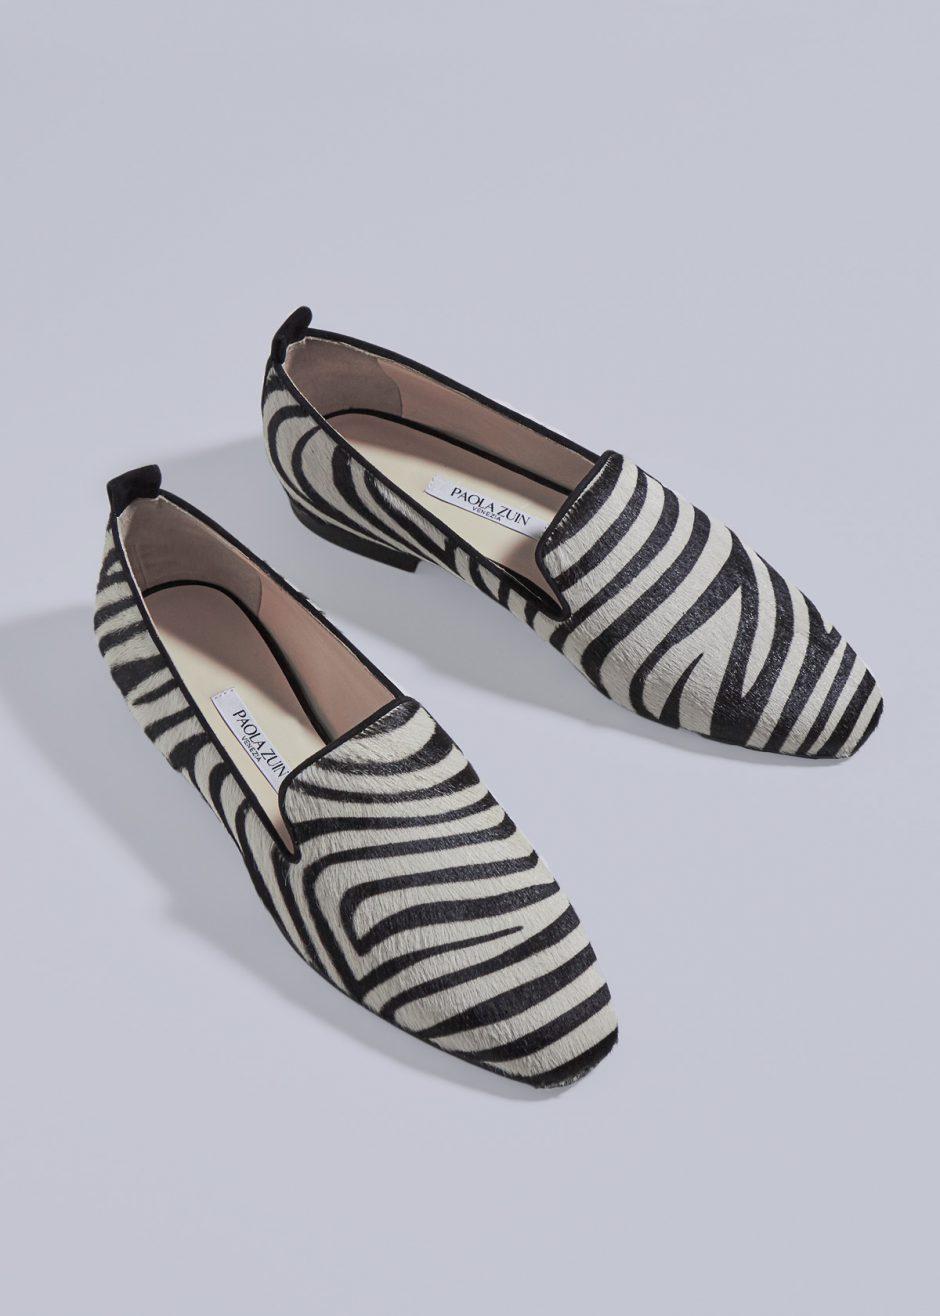 Vicky – Ballerina in suede in cavallino zebrato nero